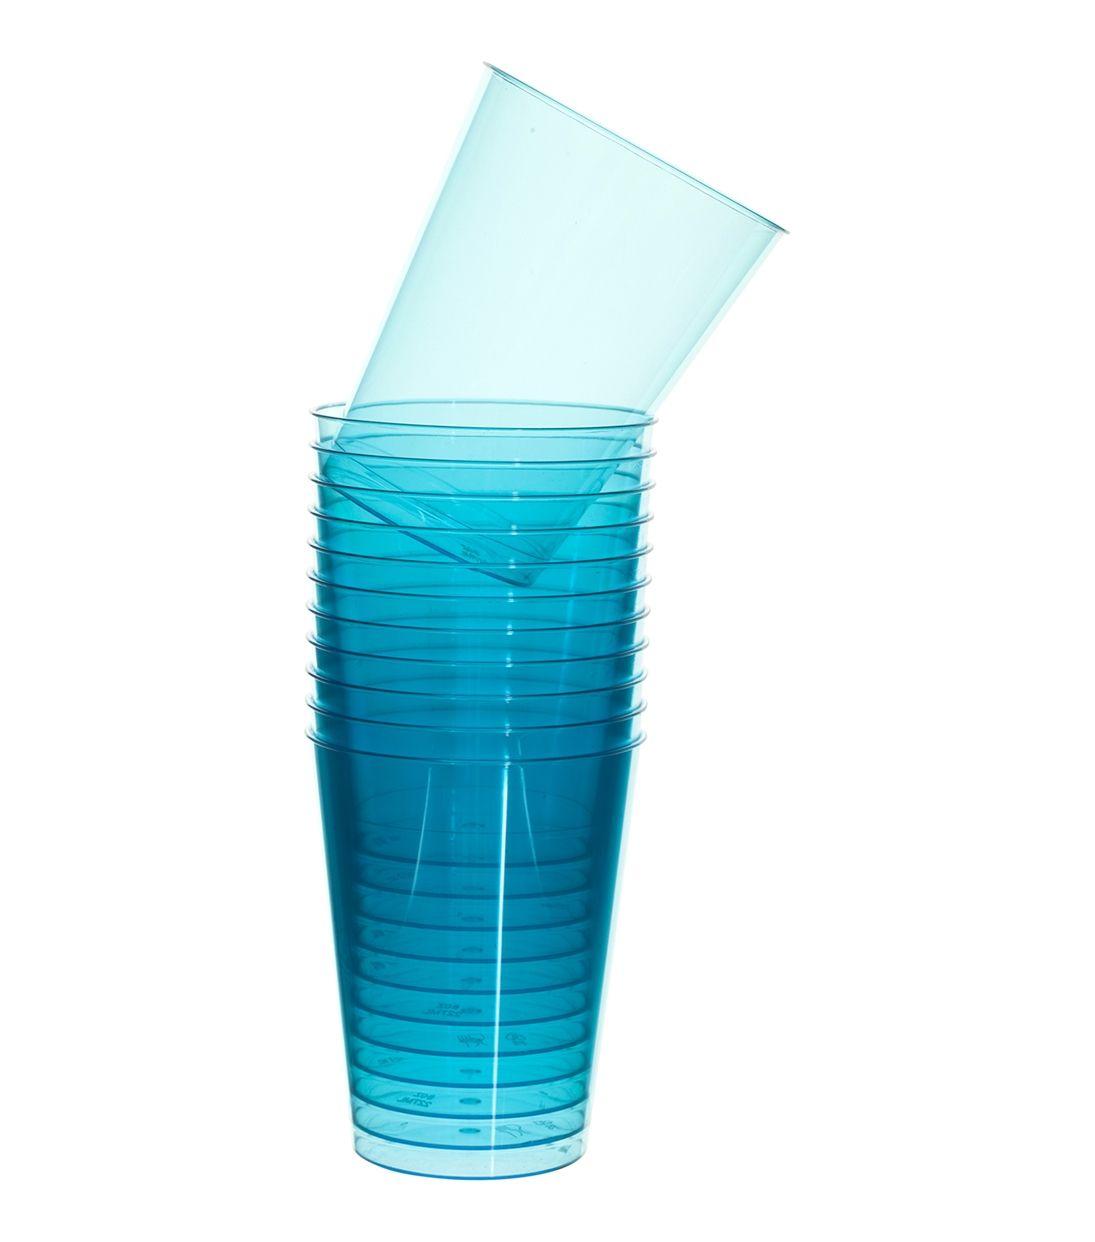 Cageot Pliant Recycle 39 X 29 X 15 Cm Ocre Bottle Water Bottle Vase